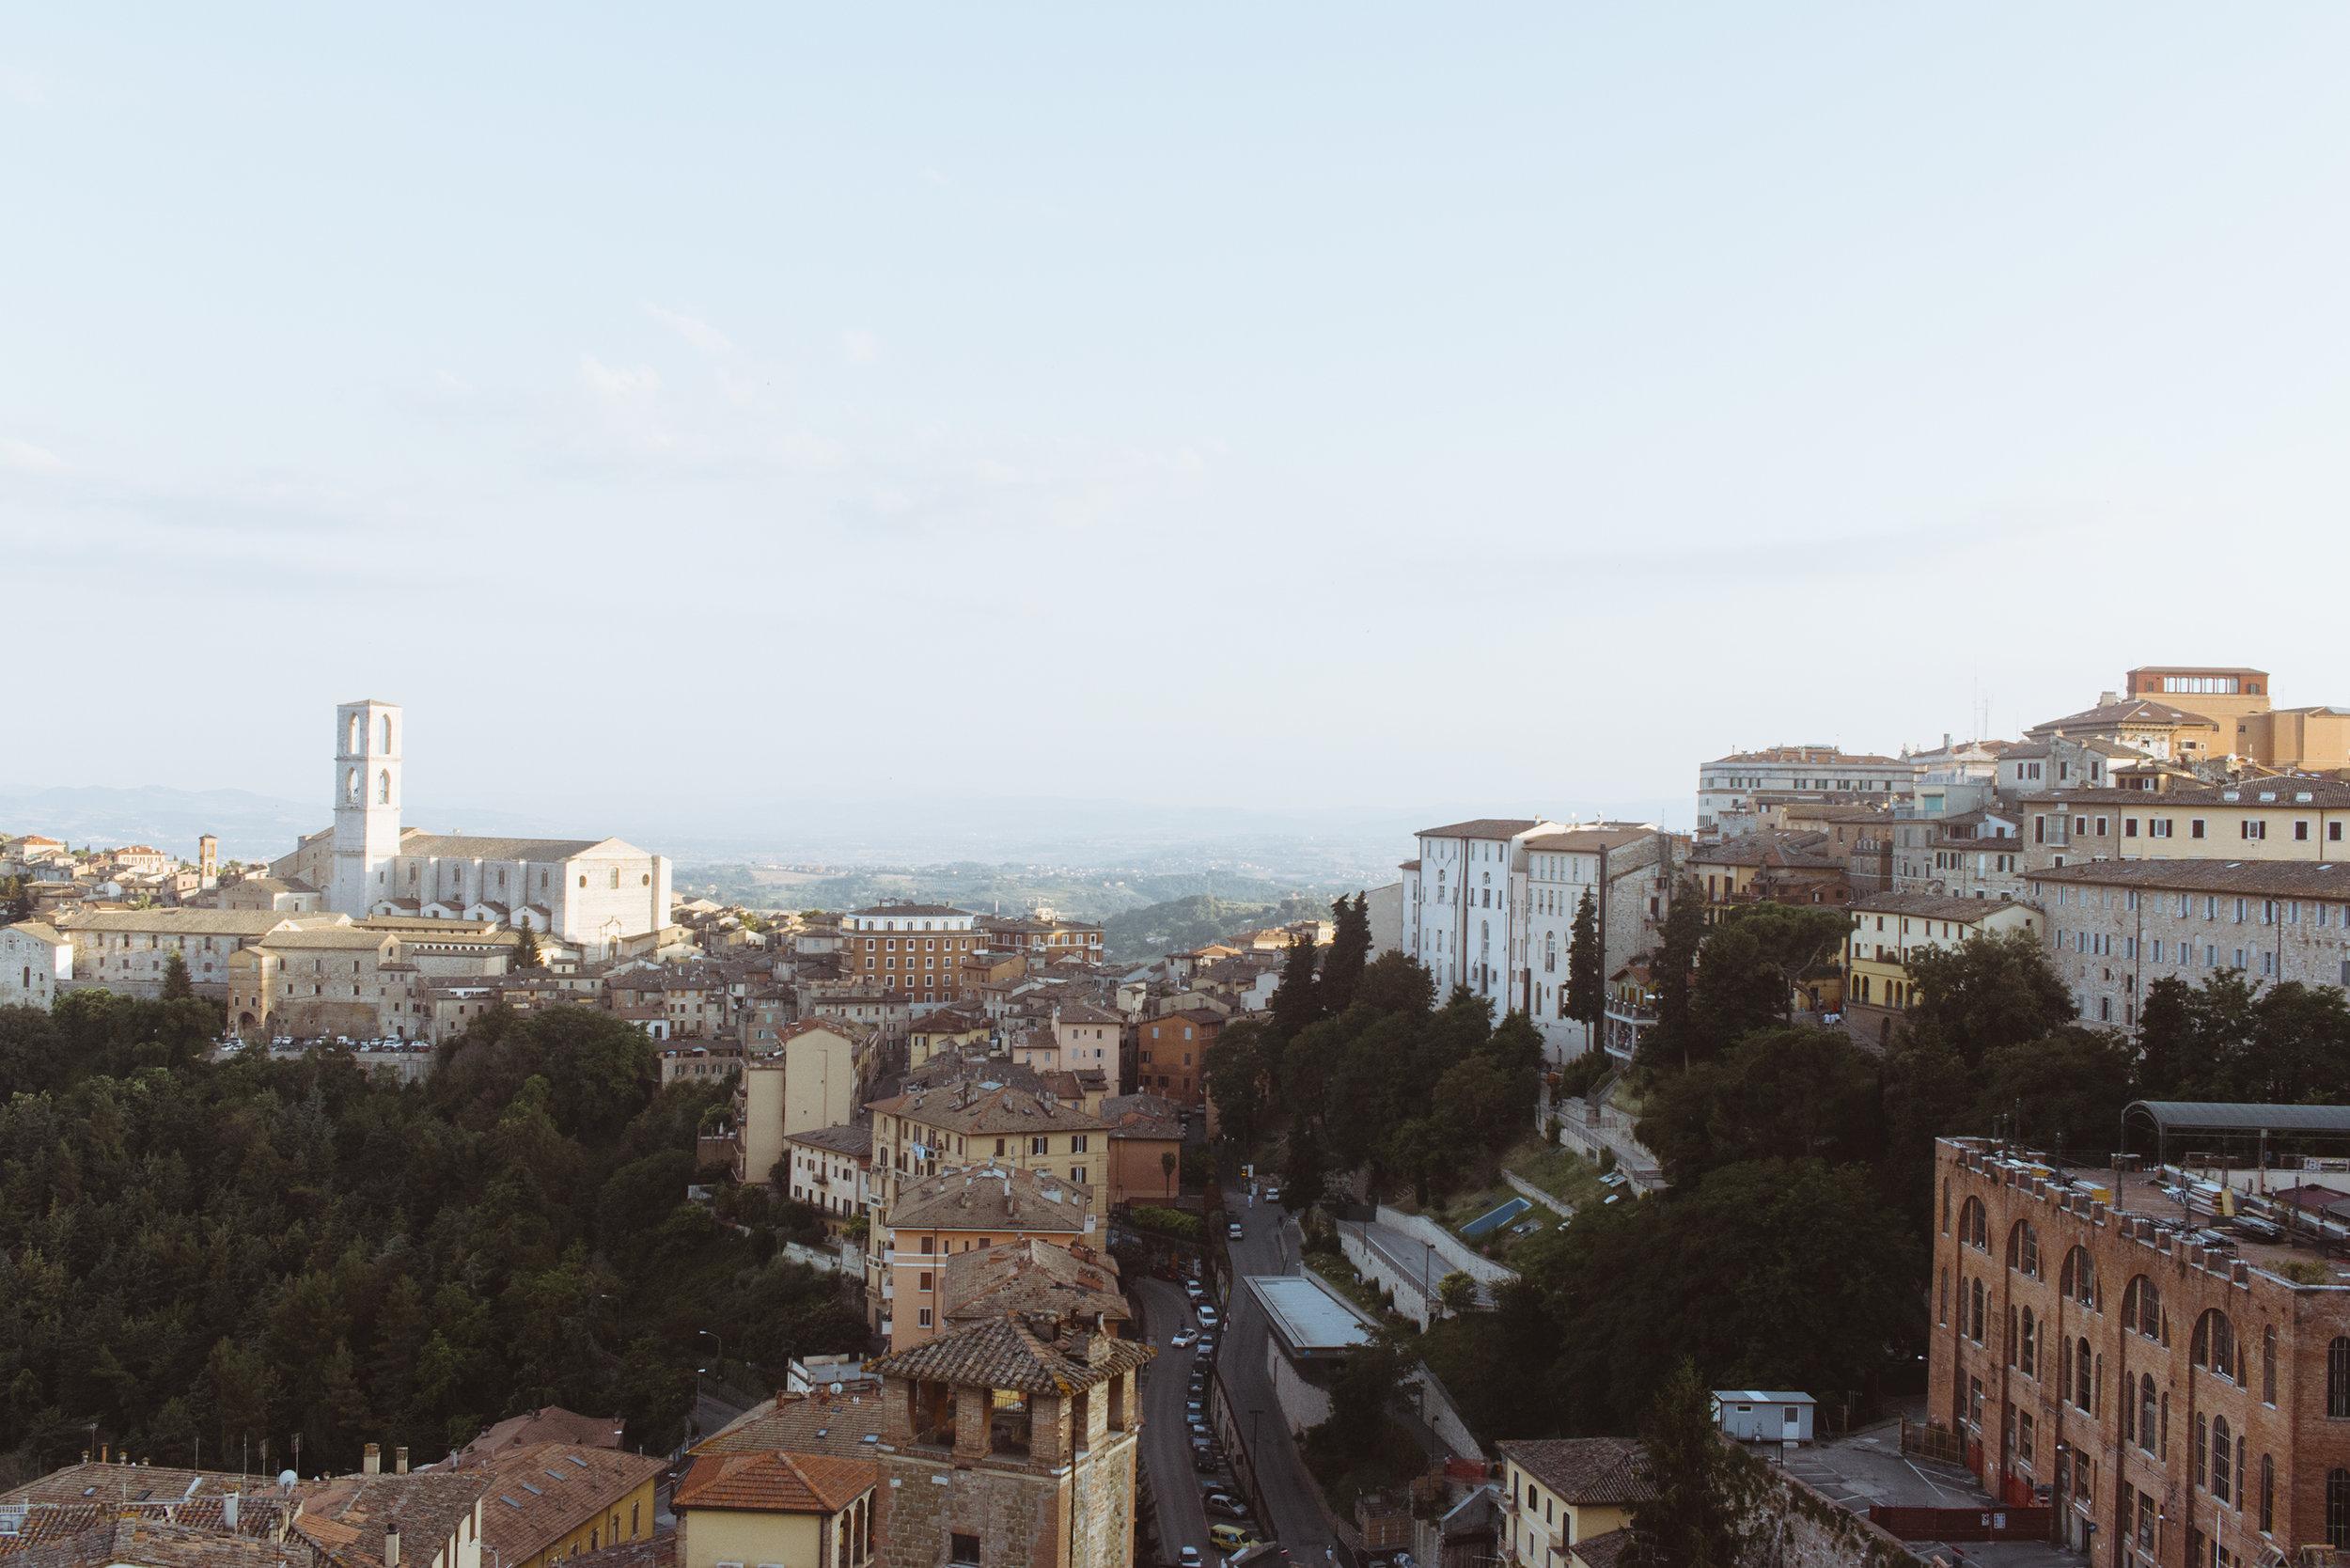 Perugia_07022016_112.jpg